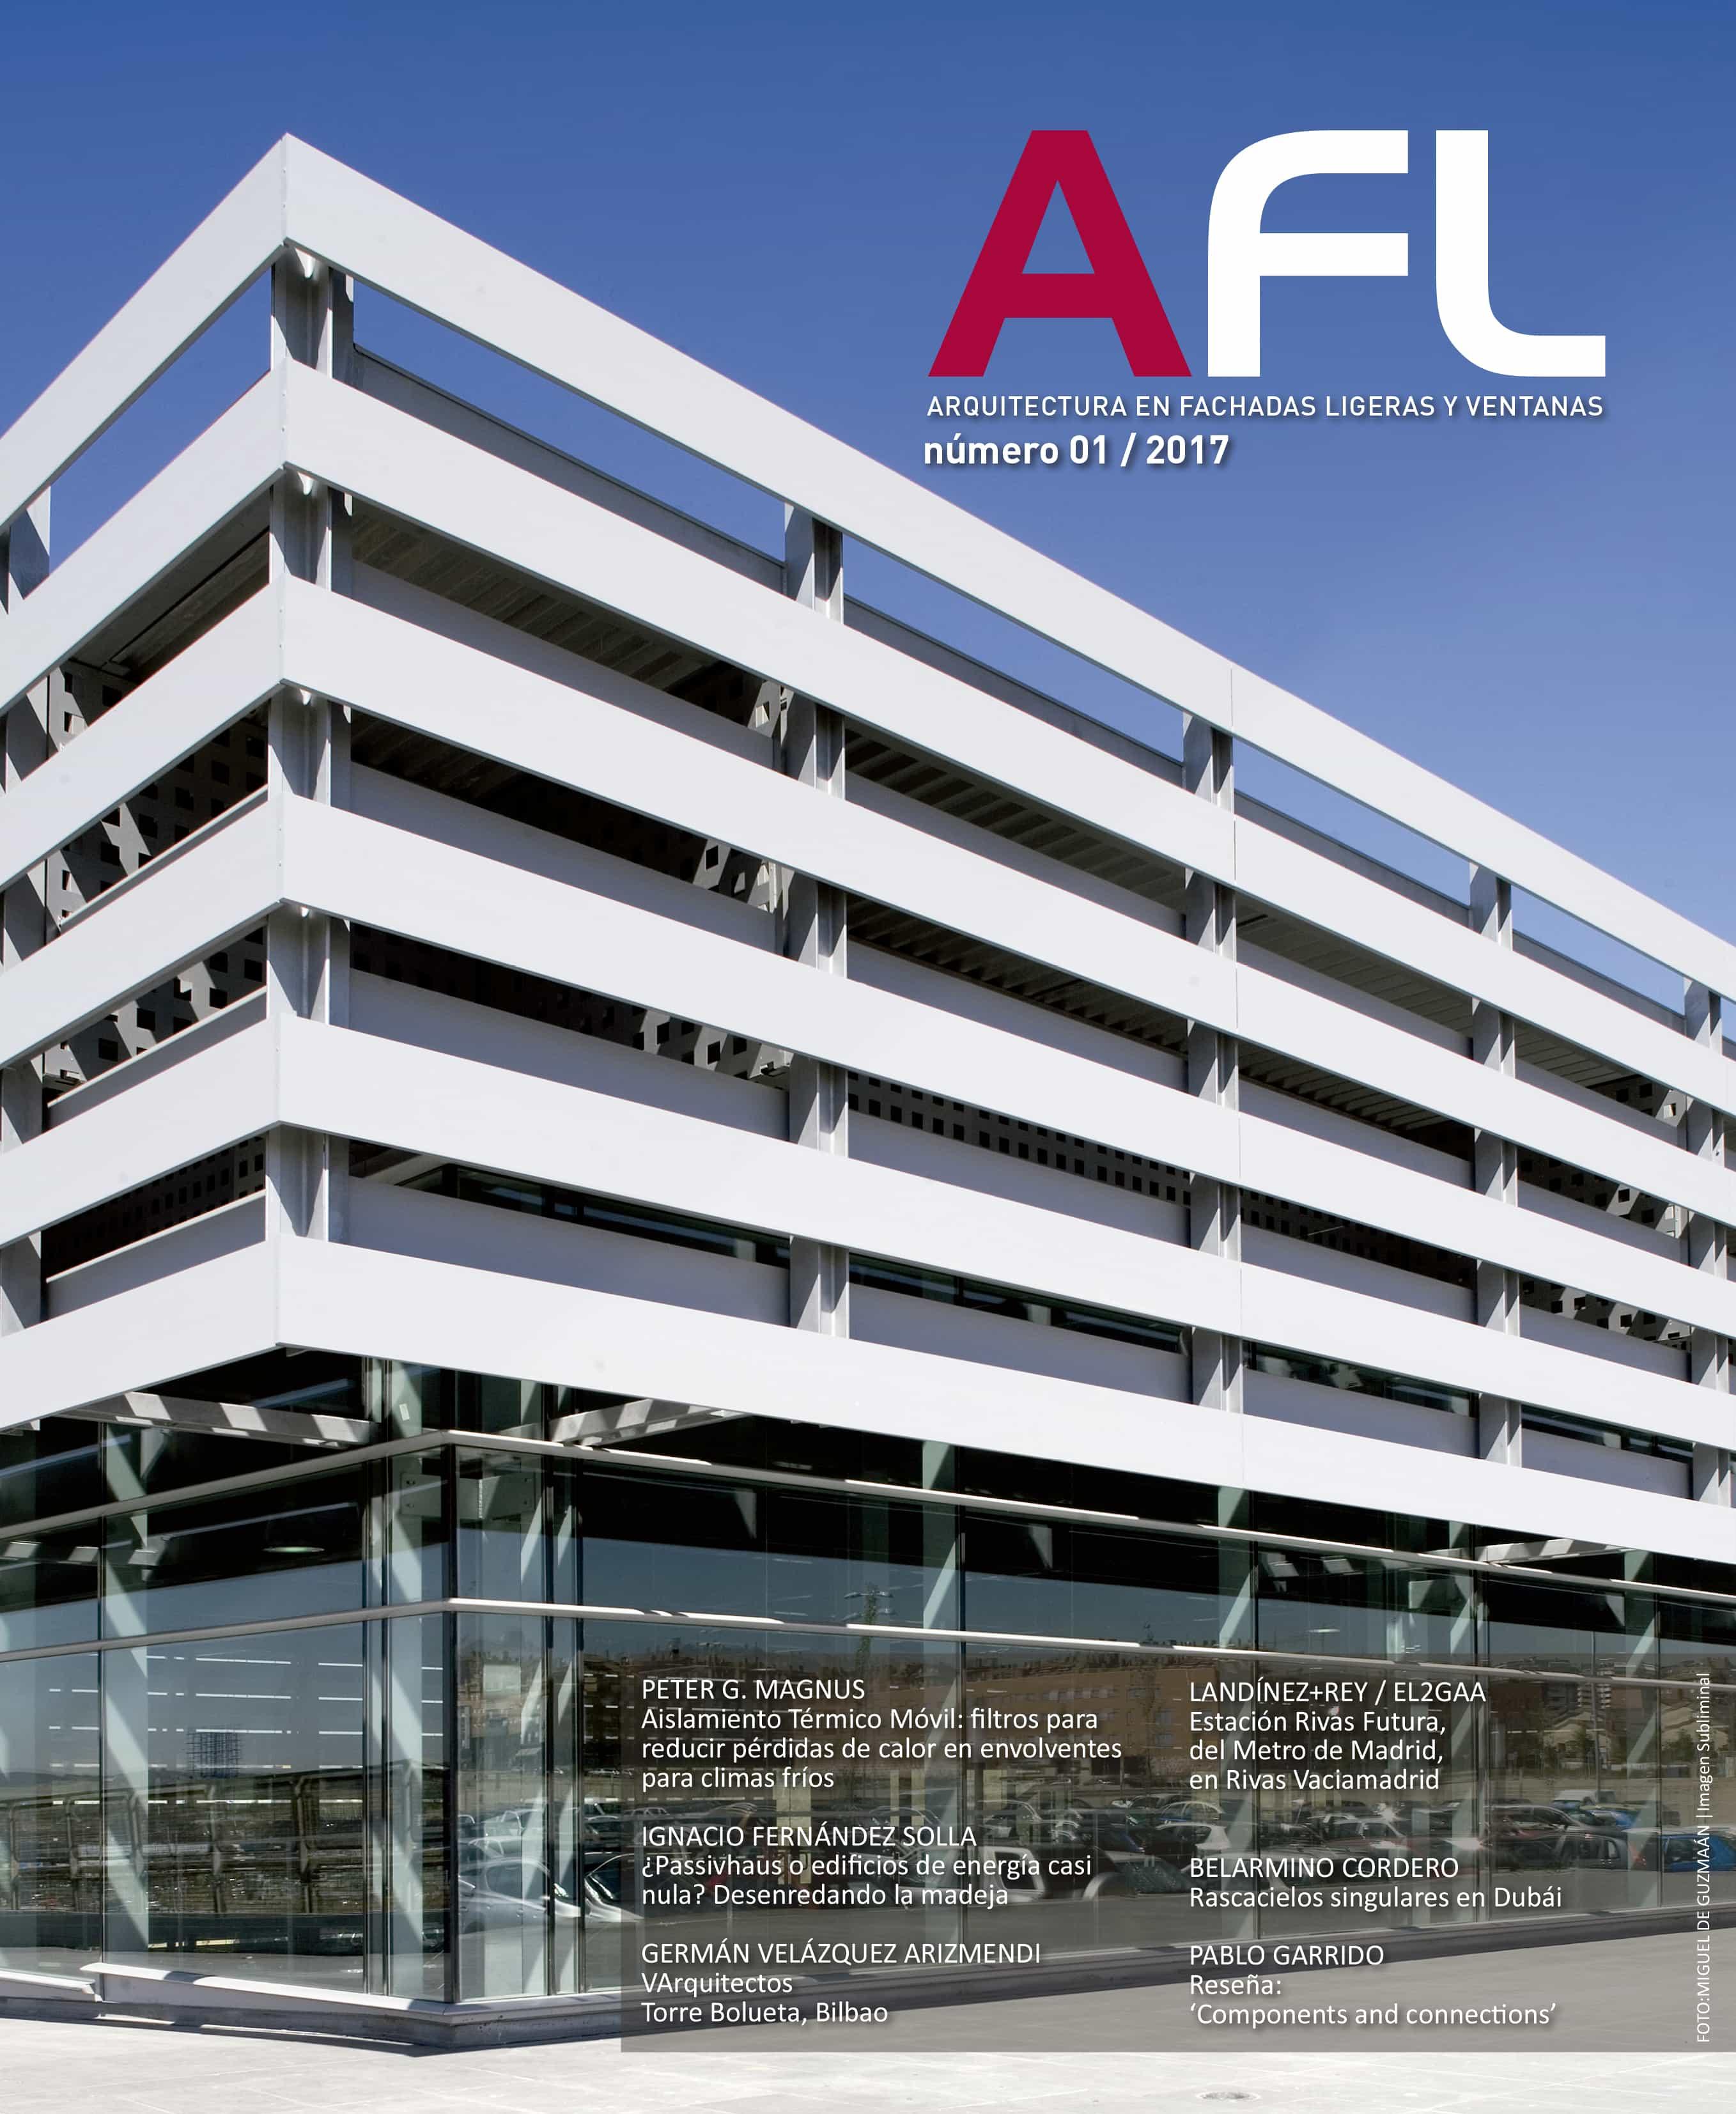 obra publicada - LANDINEZ+REY arquitectos portada revista AFL_AF28 estacion metro rivas-futura arquitectura transporte